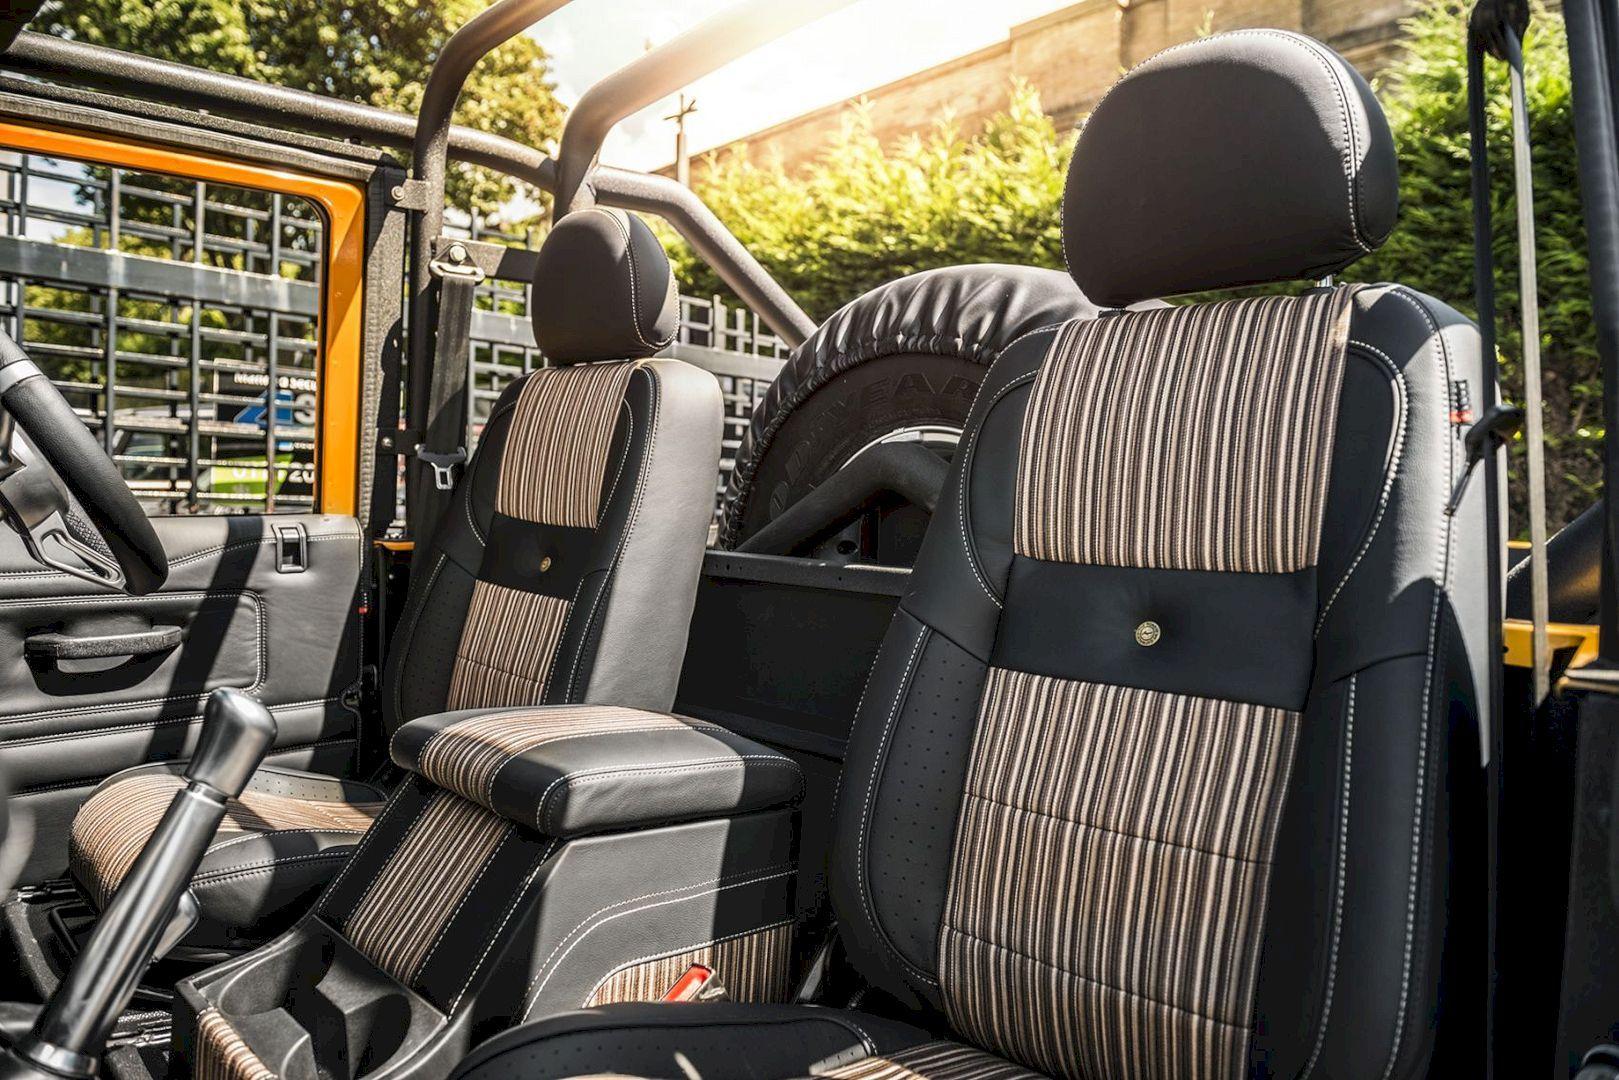 Defender 2 2 Tdci Xs 90 Chelsea Wide Track For Those Who Loves To Brag Land Rover Defender Land Rover Defender